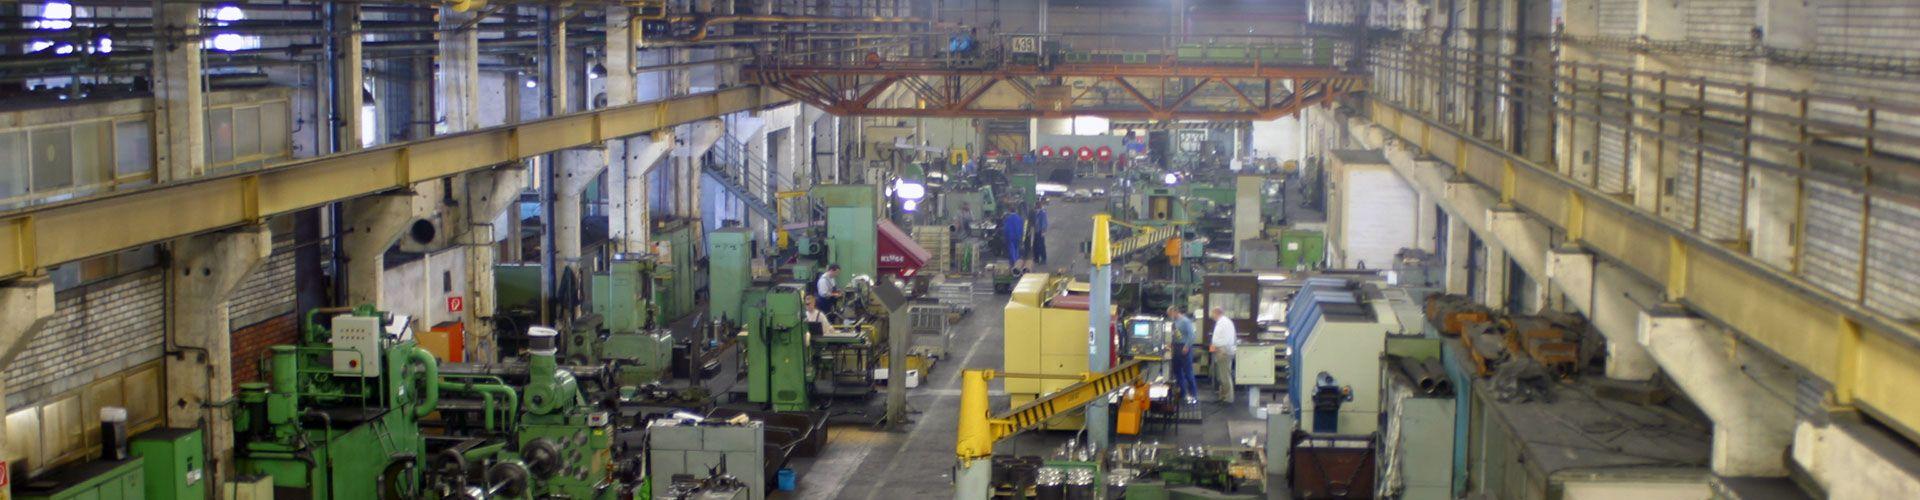 Imagevideo - Maschinenbau Mundil GmbH